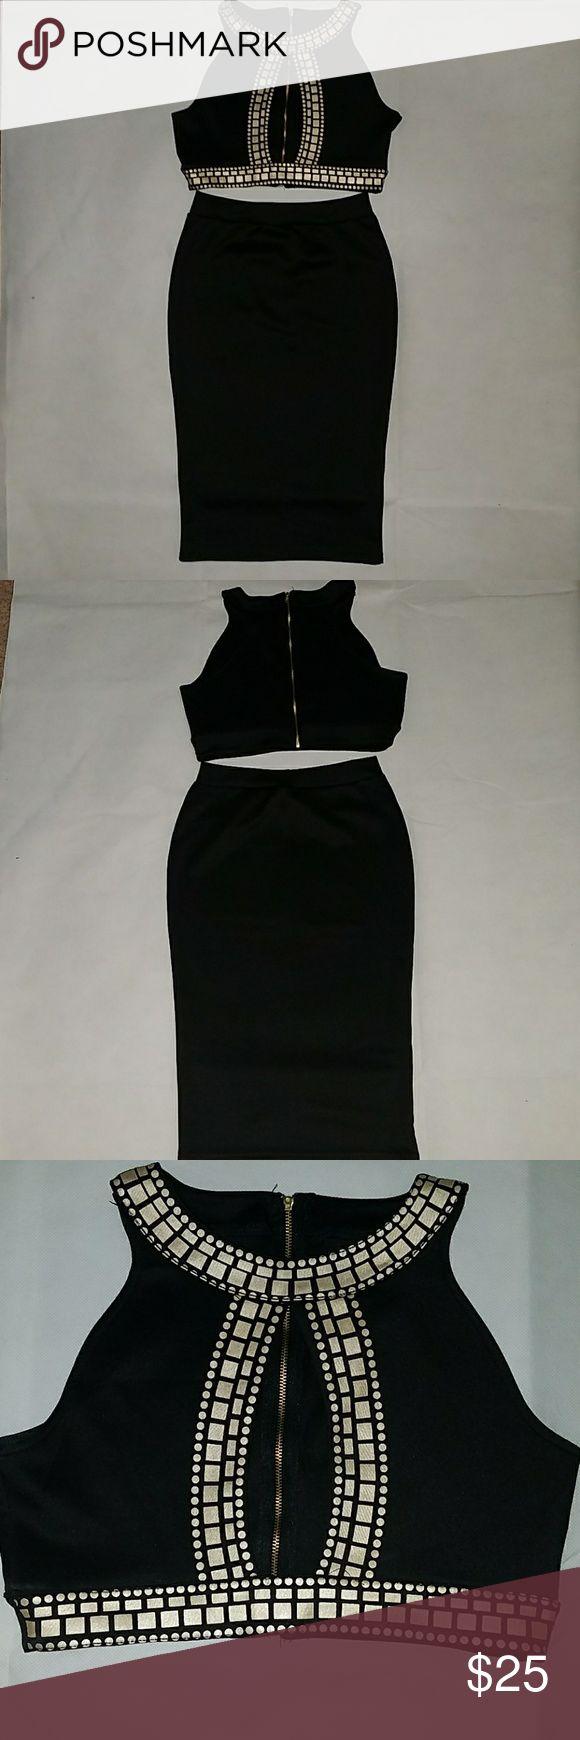 NWOT 2 PIECE GOLD TRIBAL SHIRT & BLACK SKIRT SET NWOT 2 PIECE SHIRT AND SKIRT SET GOLD TRIBAL SHIRT & BLACK SKIRT GOLD ZIPPER IN THE BACK OF SHIRT Skirts Skirt Sets